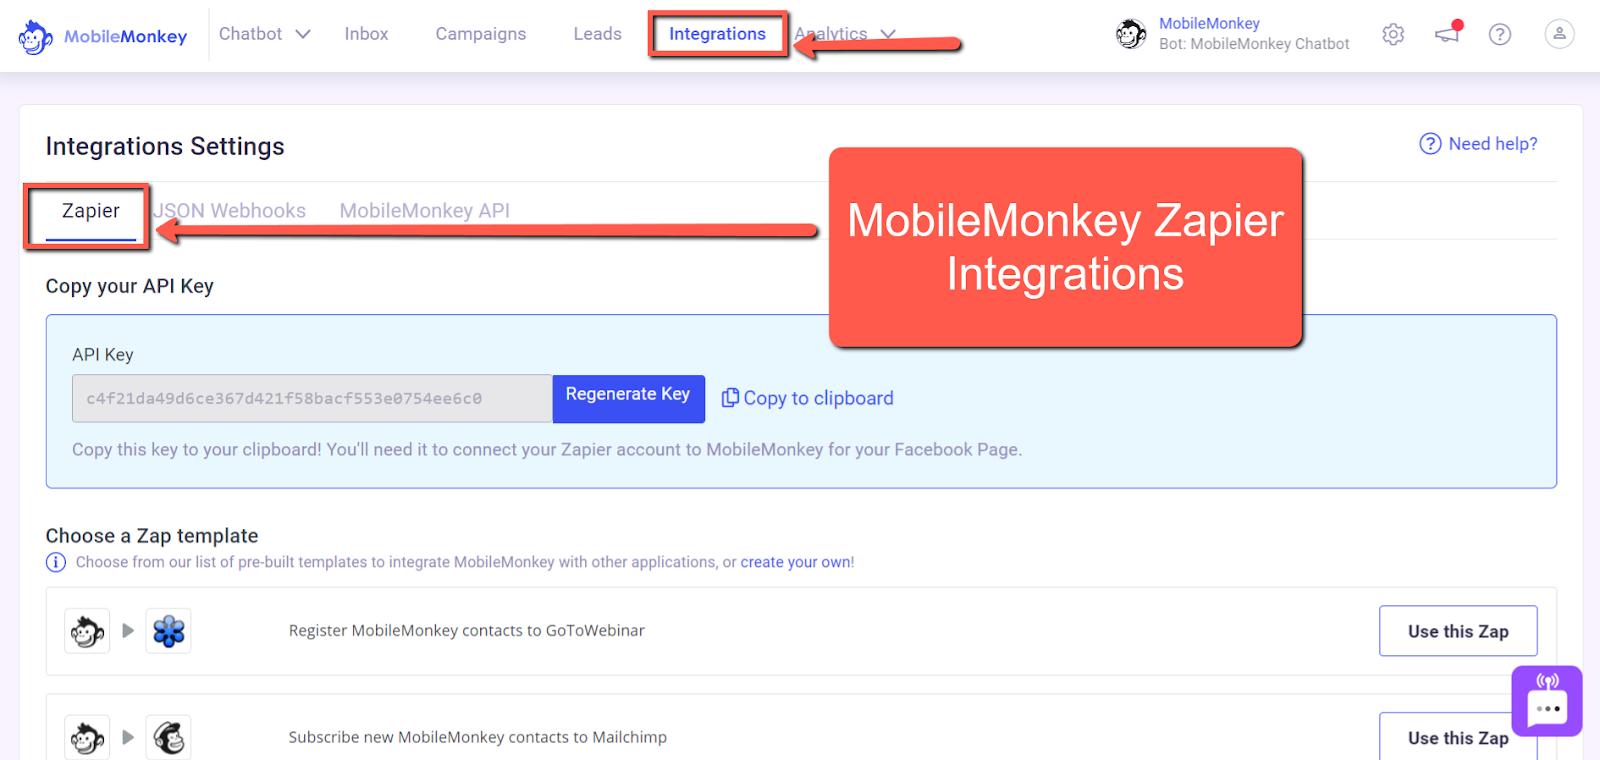 MobileMonkey Zapier integrations